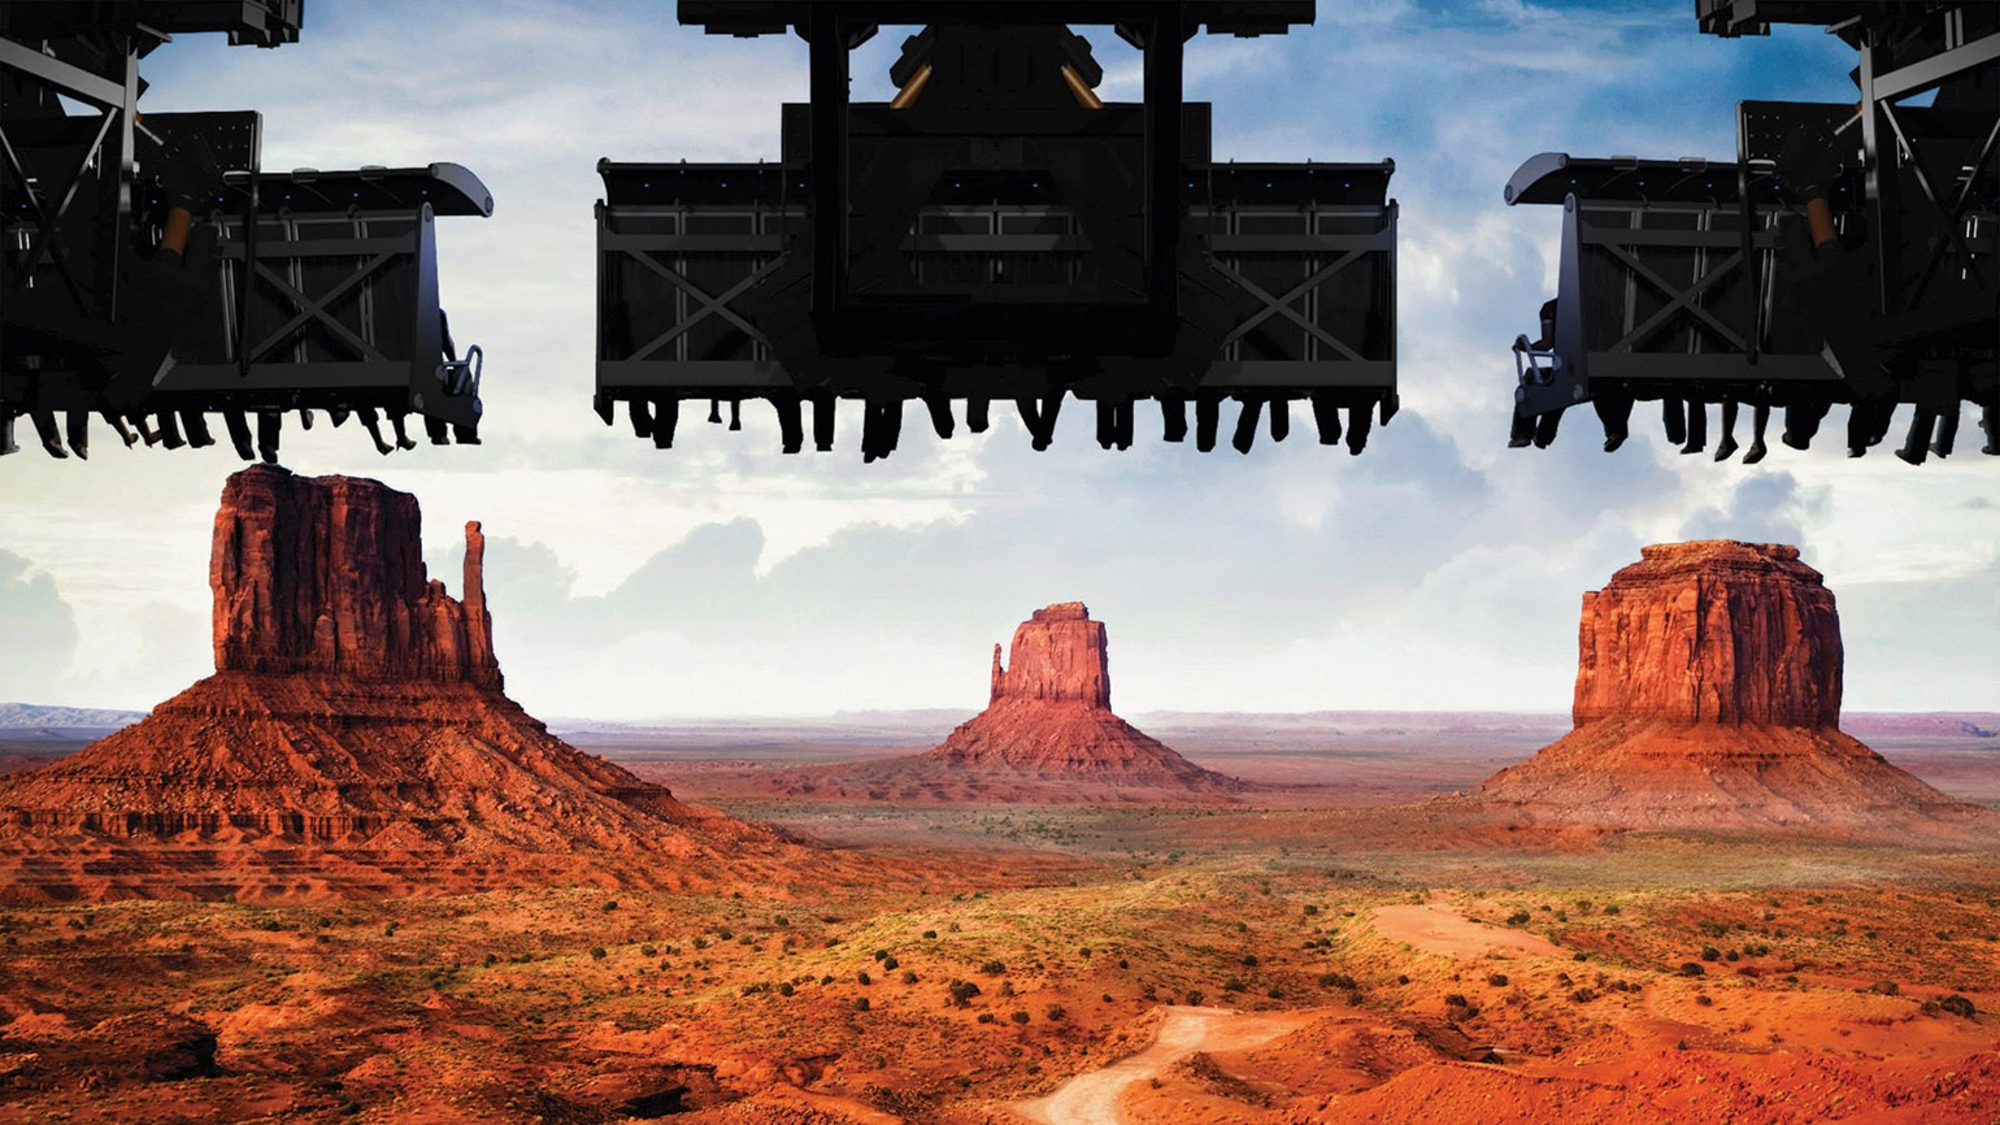 Now boarding: Las Vegas' newest 'Wild' ride